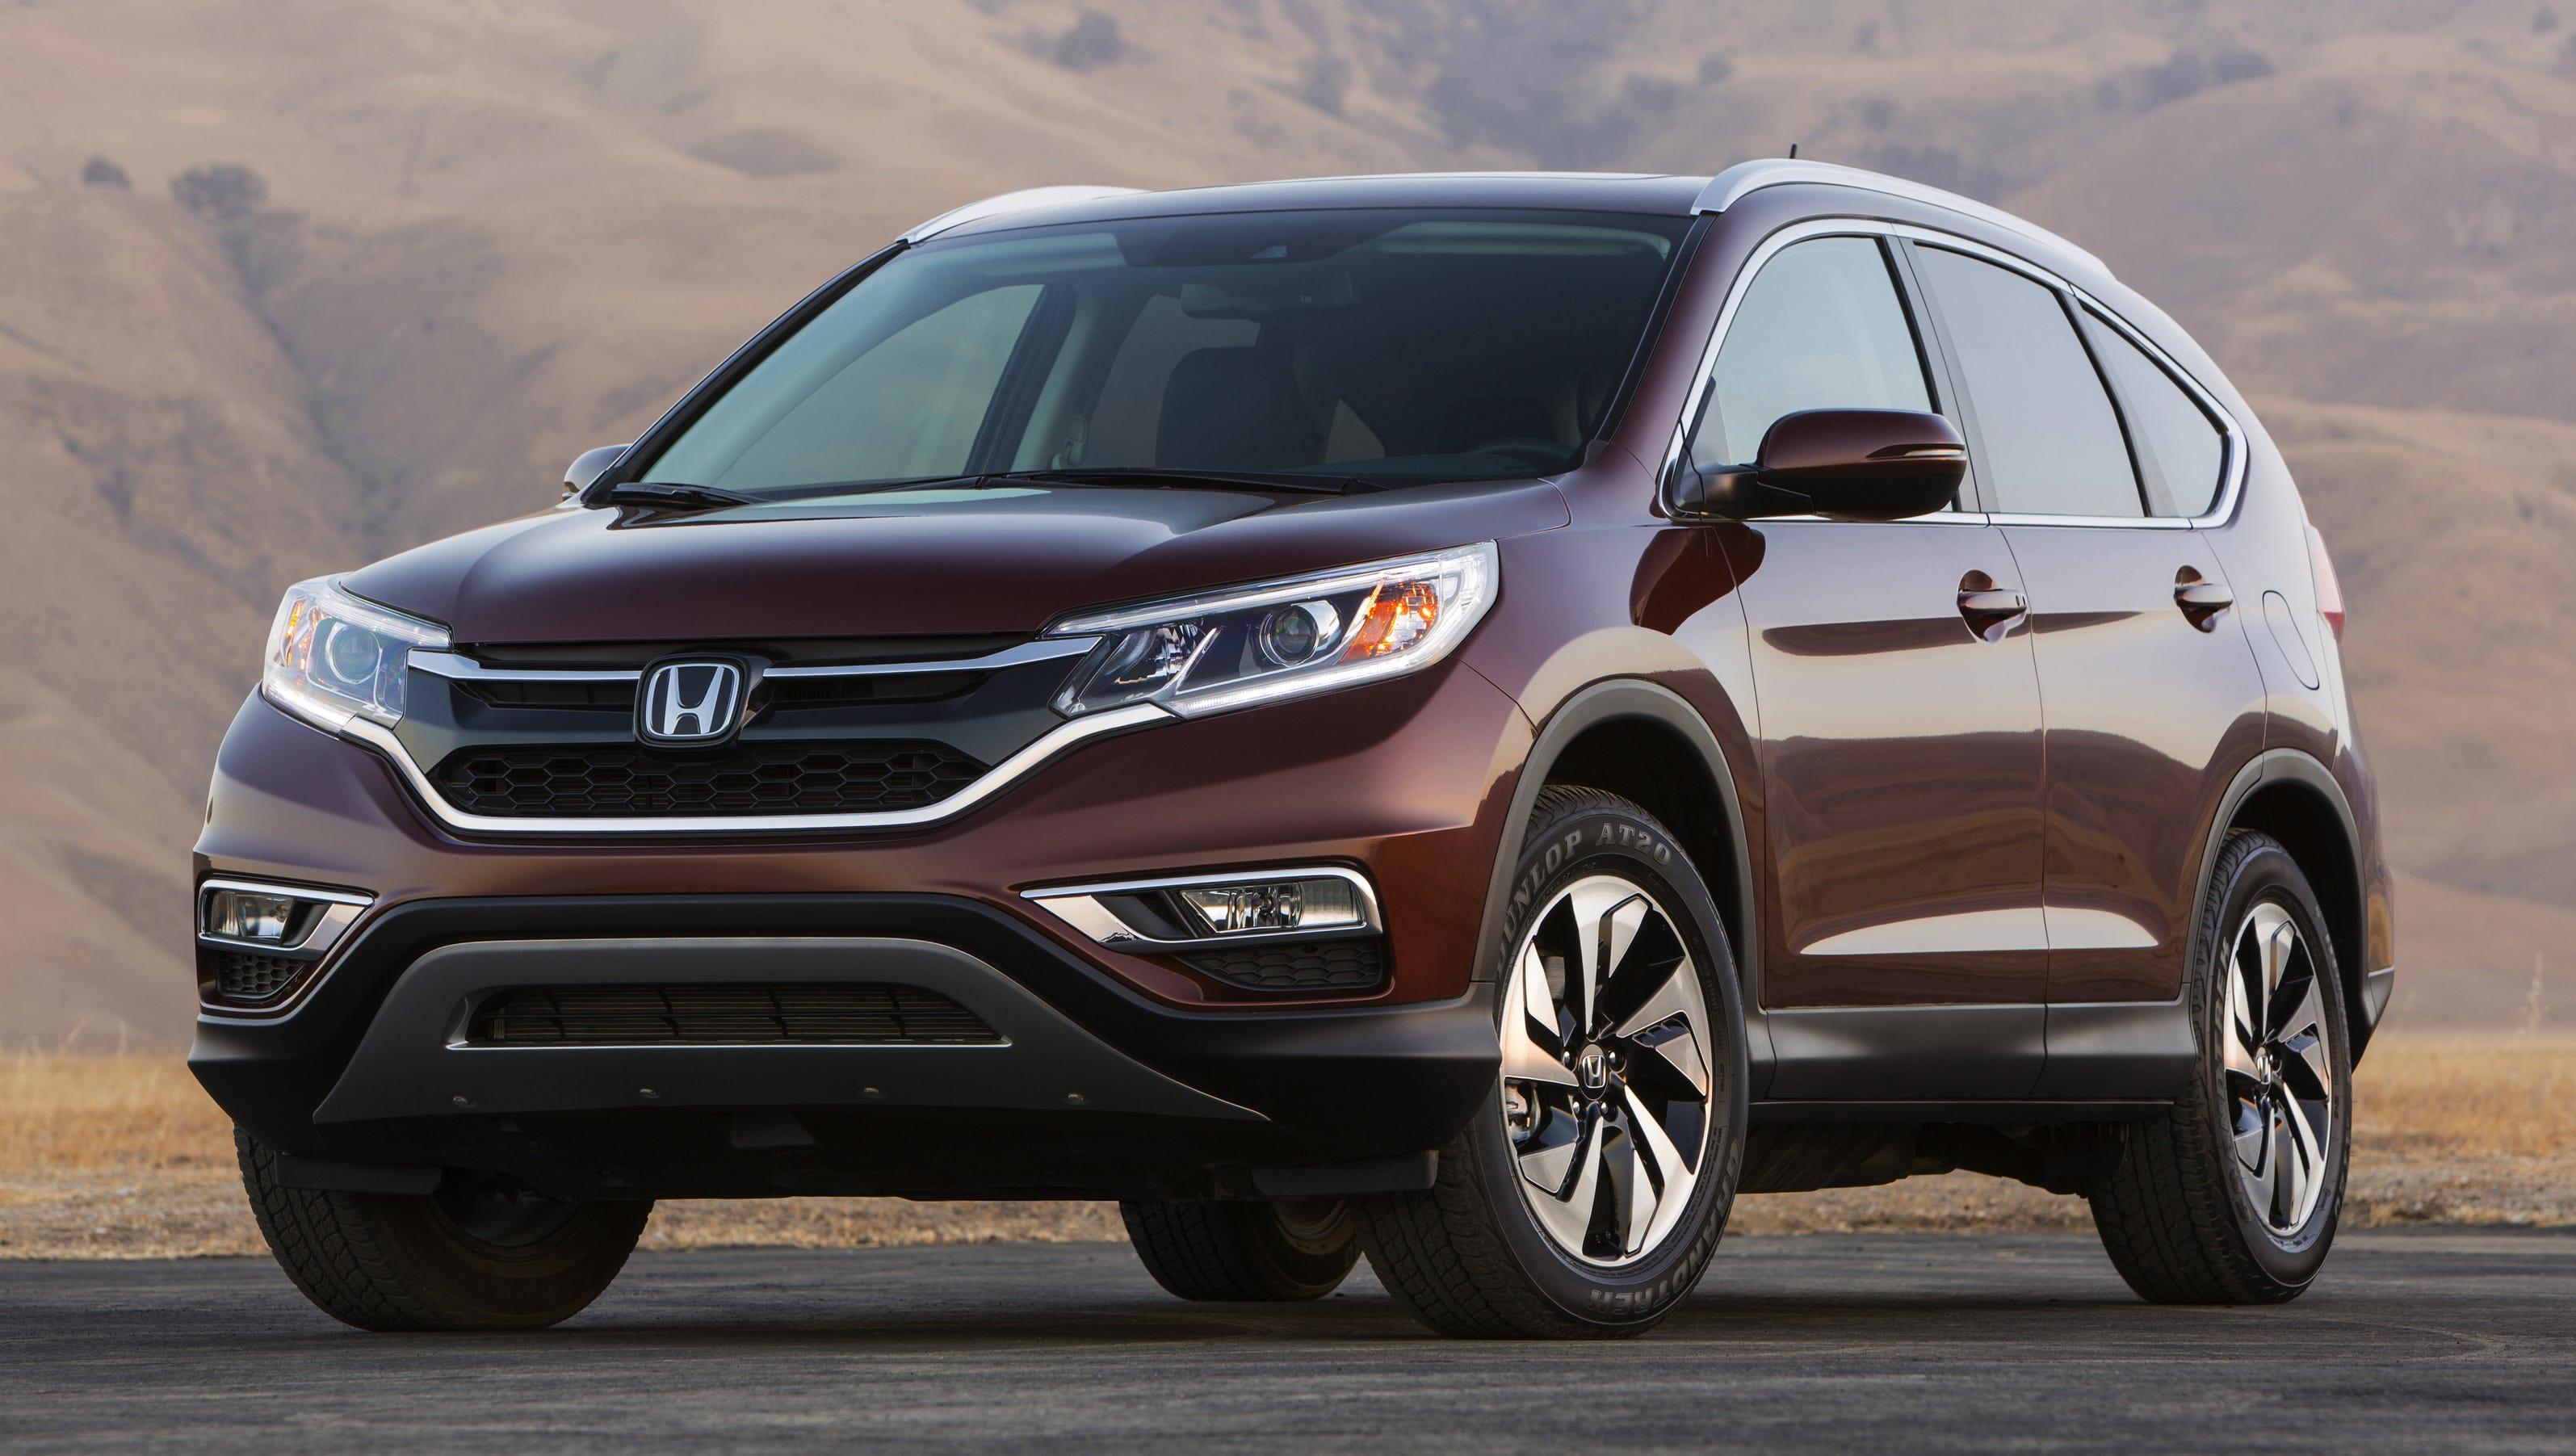 Does 2014 Honda Suv Crv Have Style Change   Autos Weblog